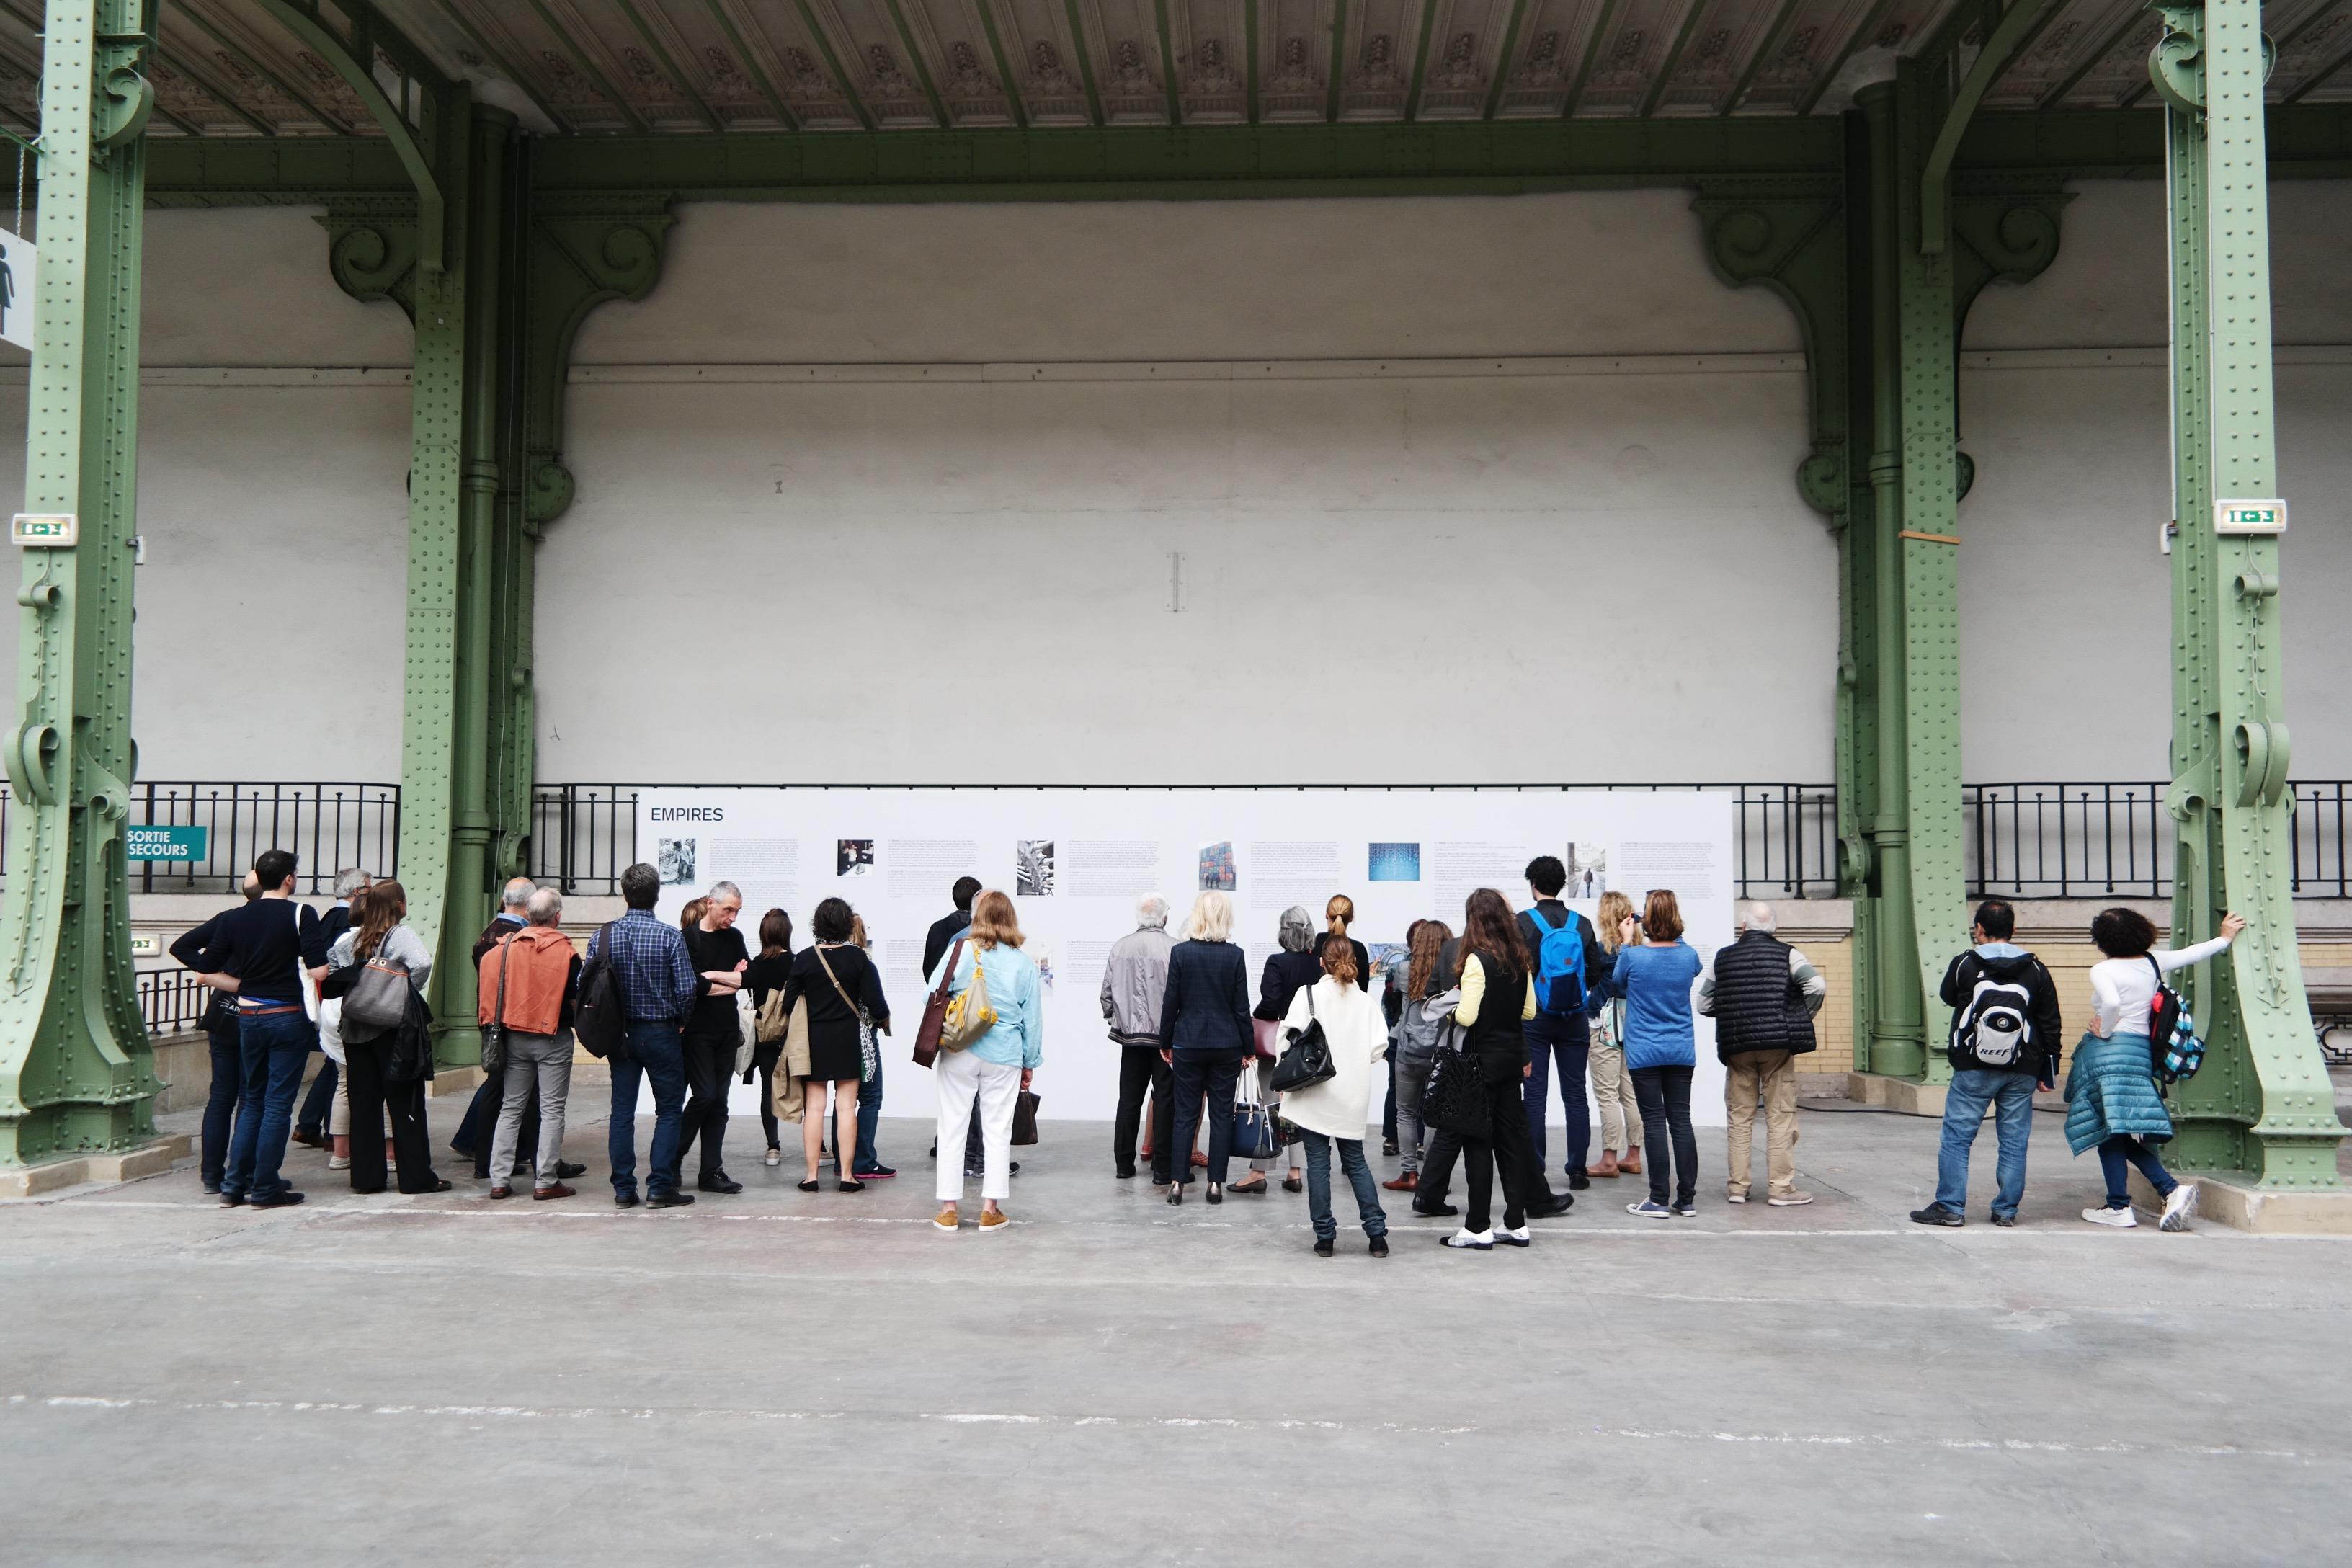 Monumenta-2016-Empires-Huang-Yong-Ping-Grand-Palais-Paris-Nef-visiteurs-lecteurs-visitors-photo-usofparis-blog